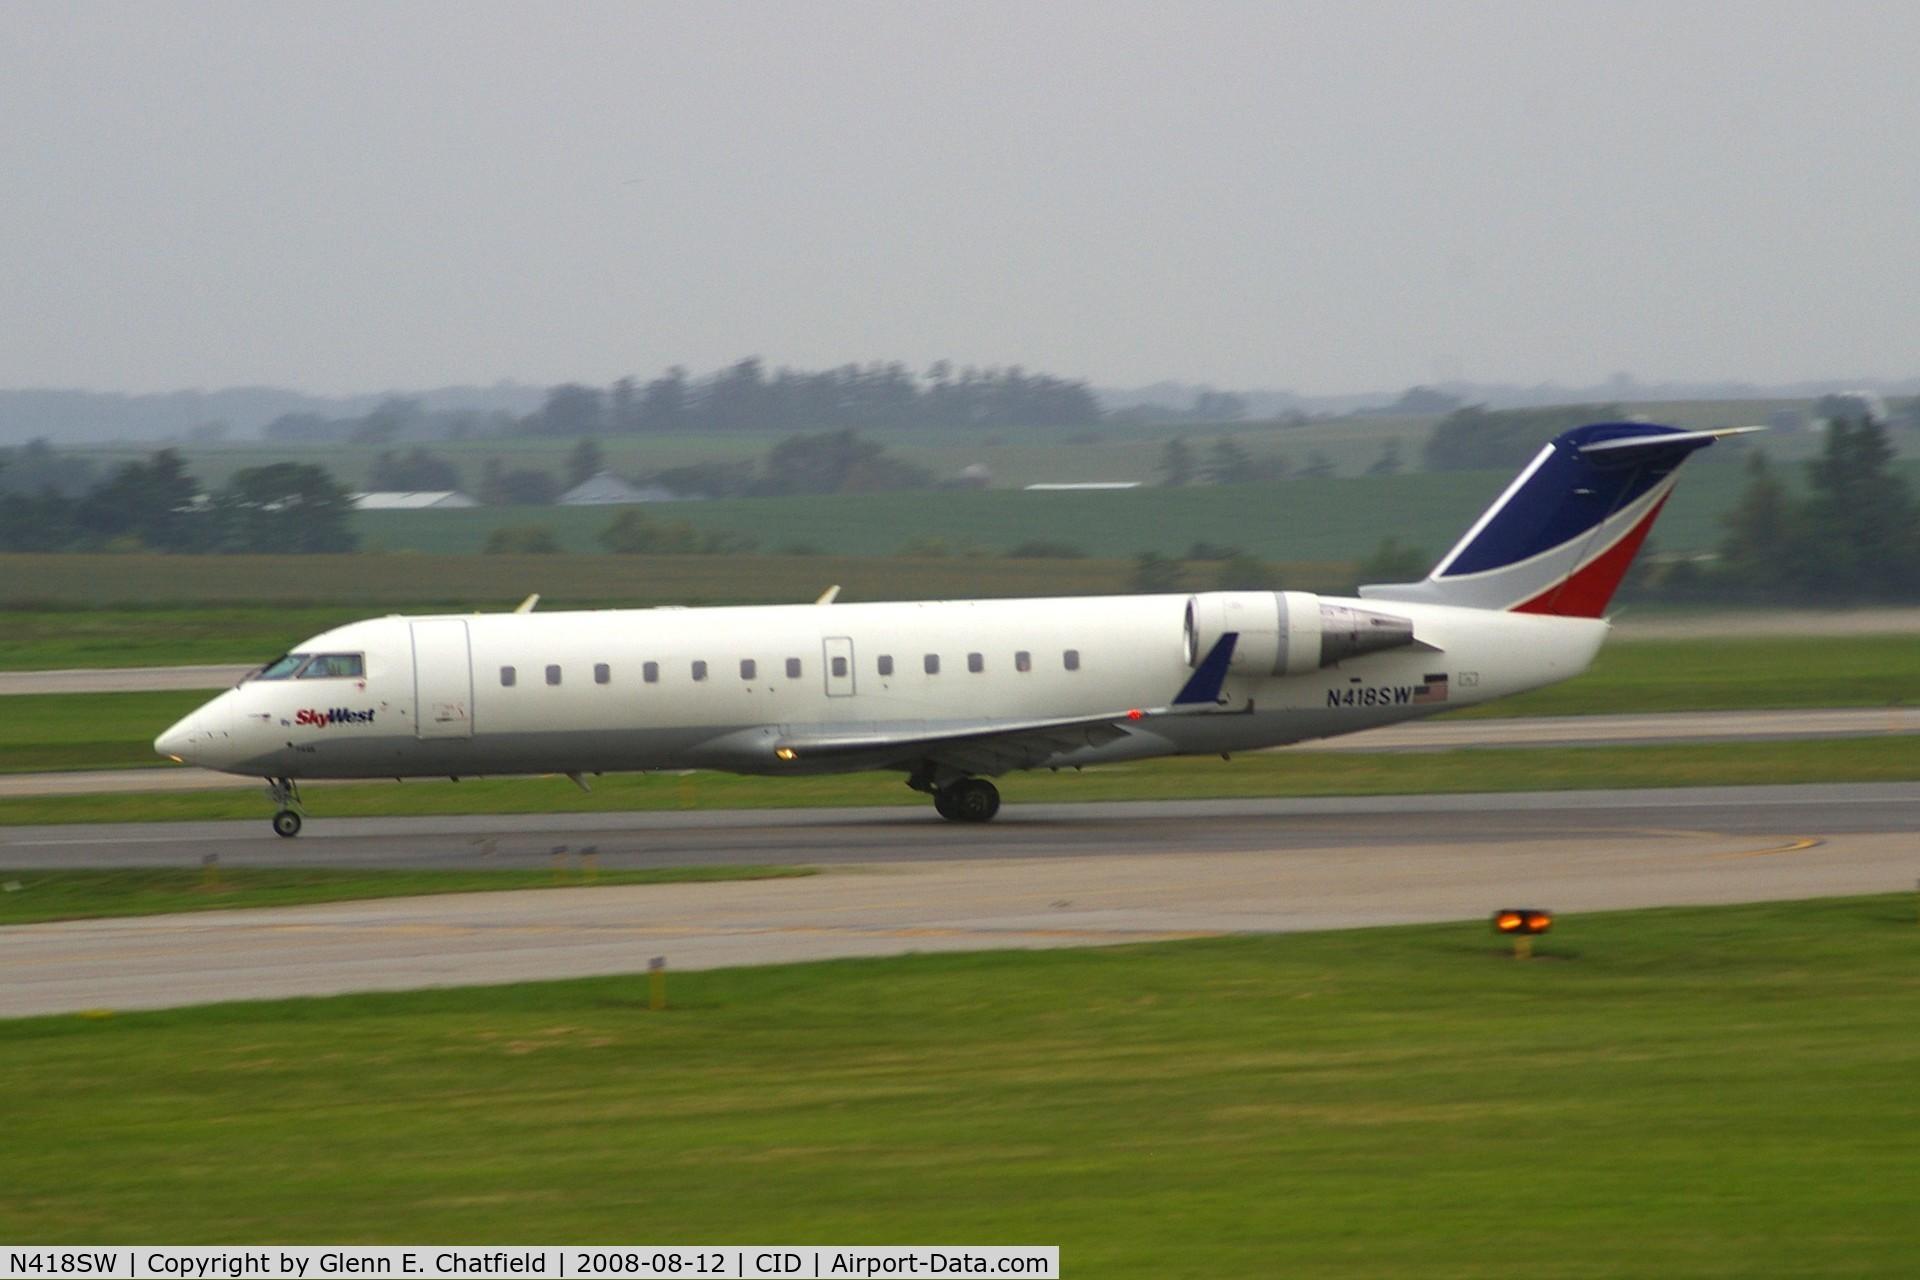 N418SW, 2000 Bombardier CRJ-200LR (CL-600-2B19) C/N 7446, Take-off roll on Runway 13 during light rain